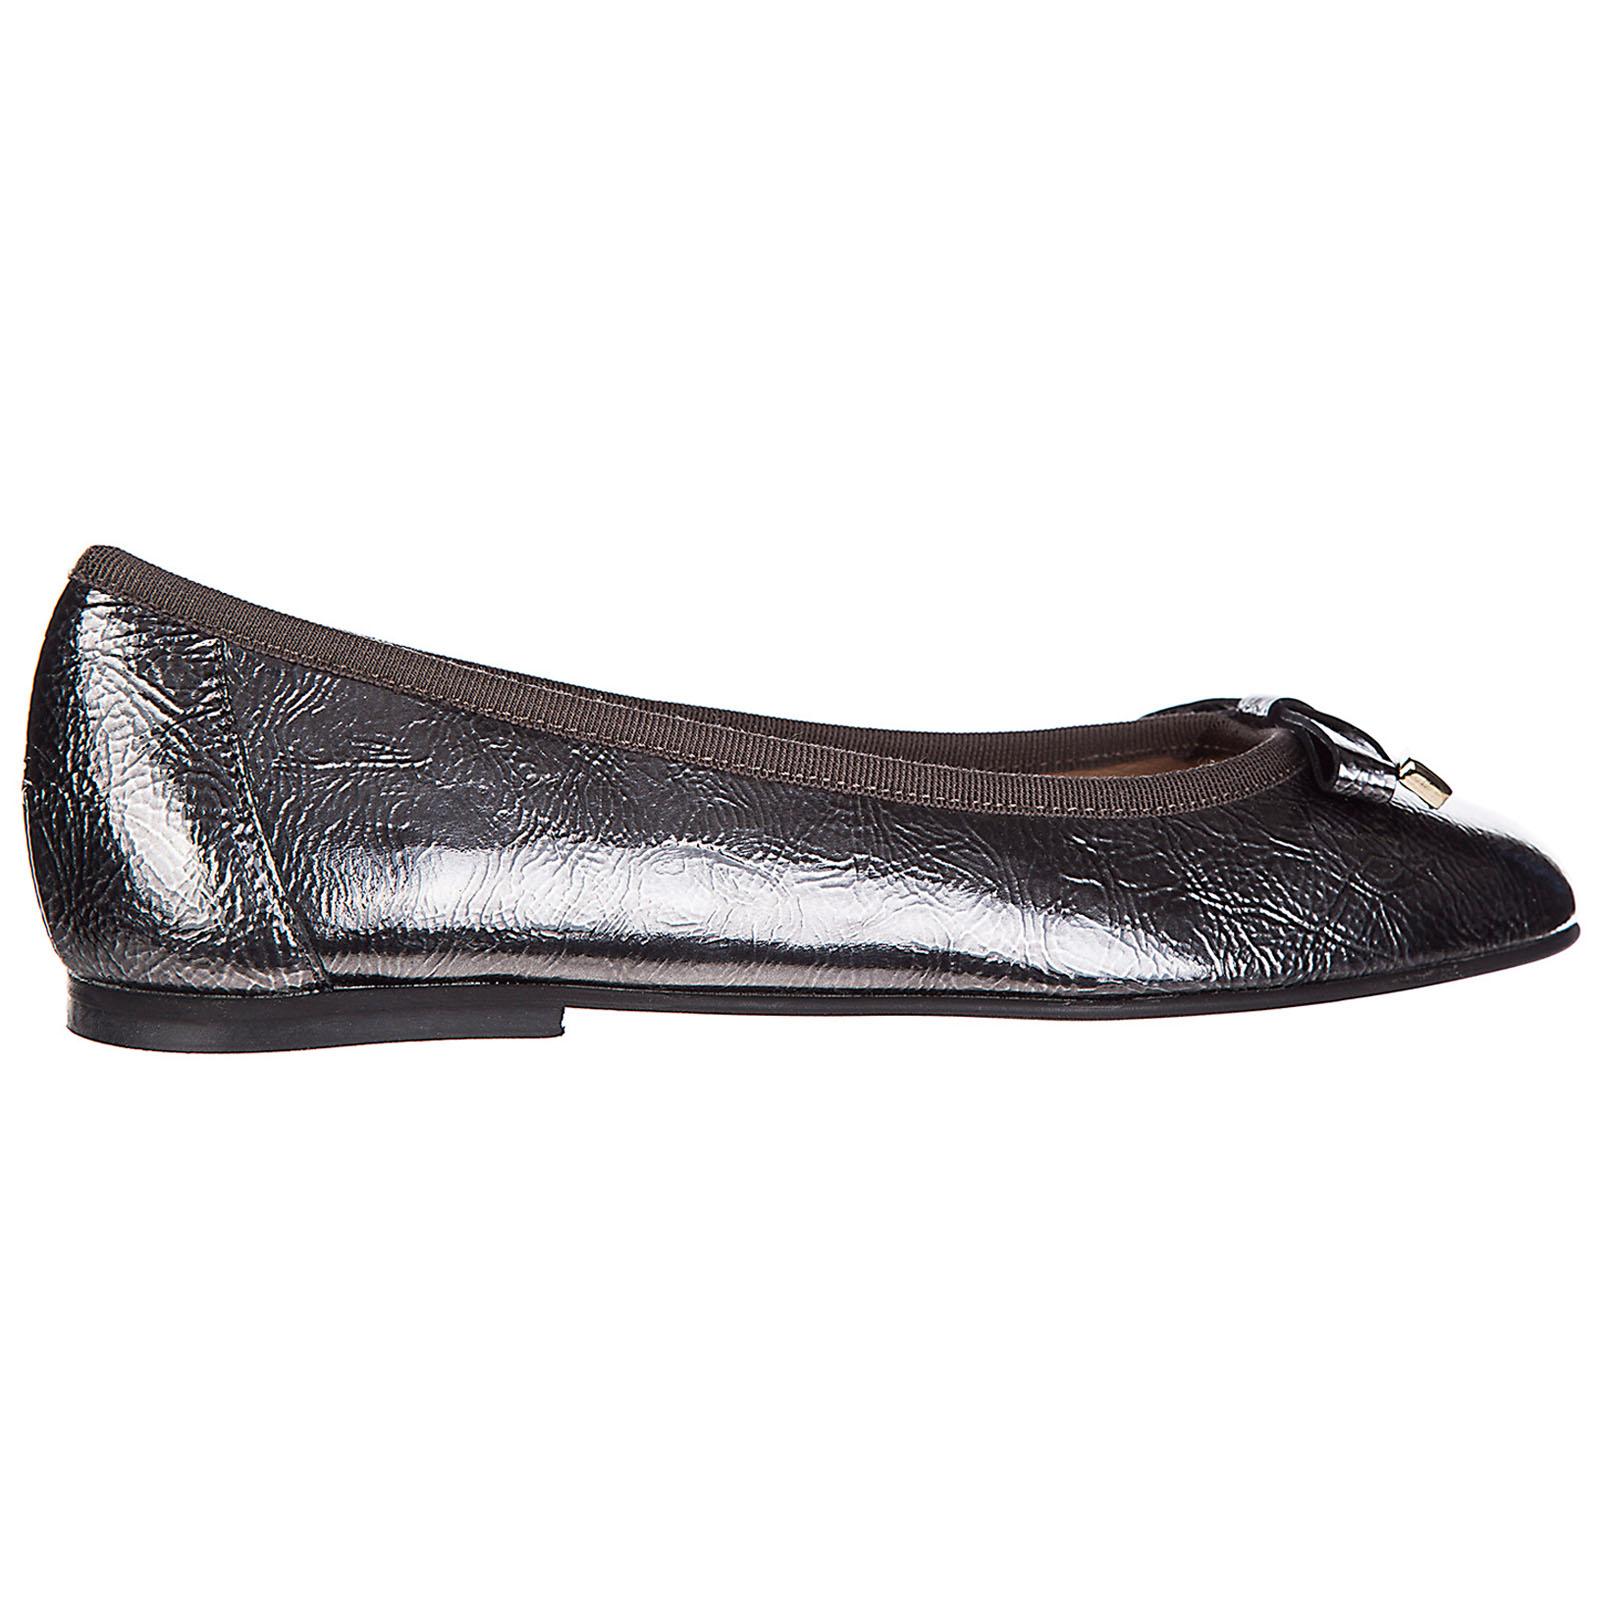 Damen leather ballet flats ballerinas